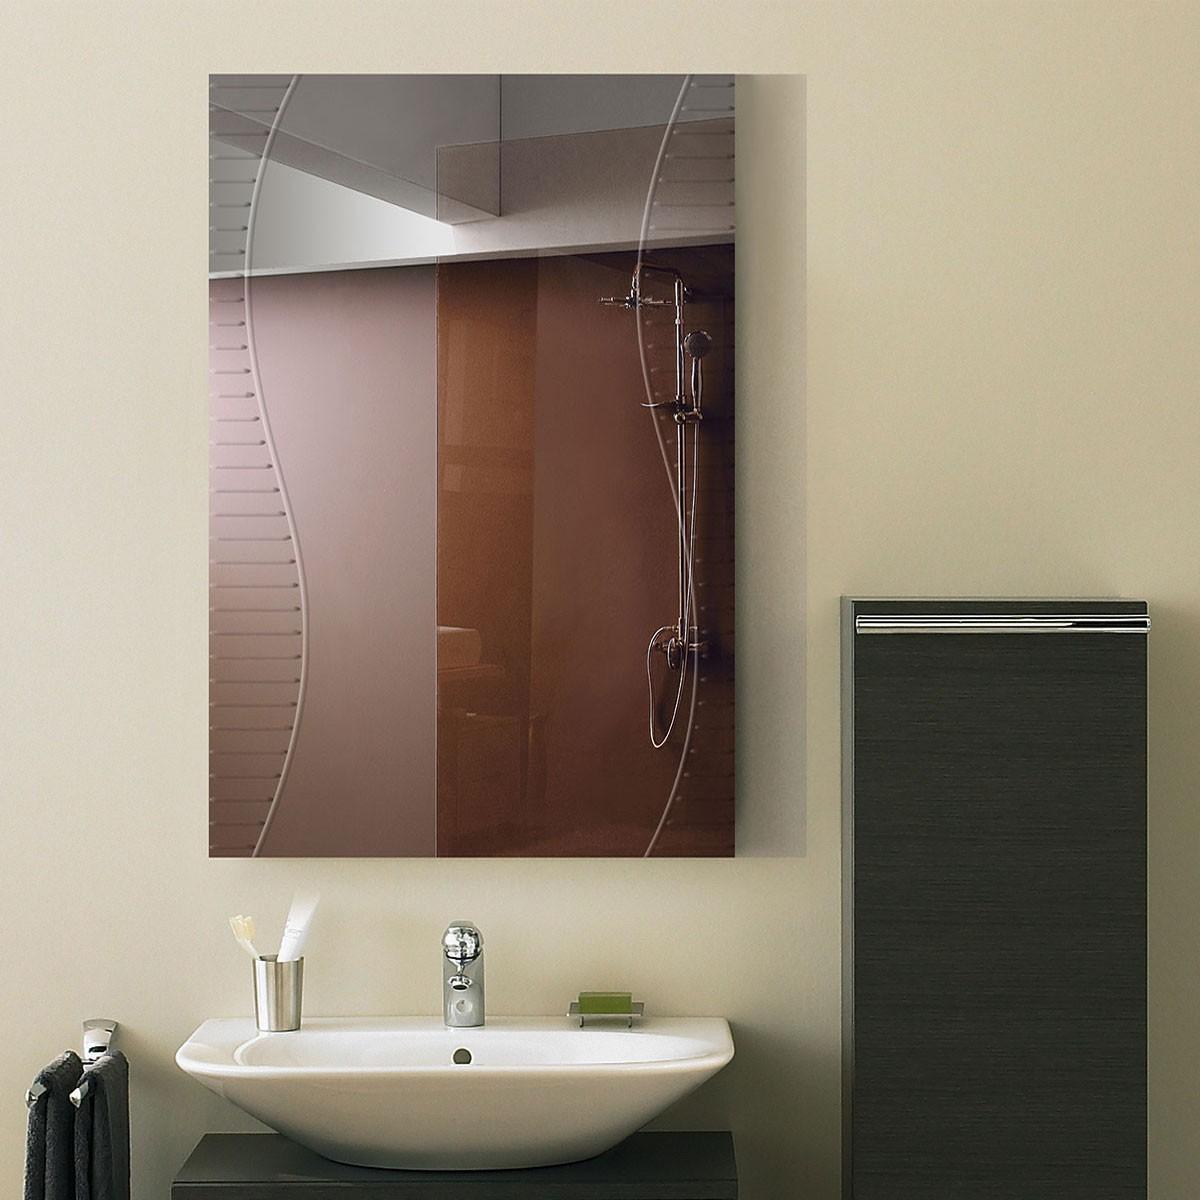 36 x 24 In. Wall-mounted Rectangle Bathroom Mirror (DK-OD-B068A)